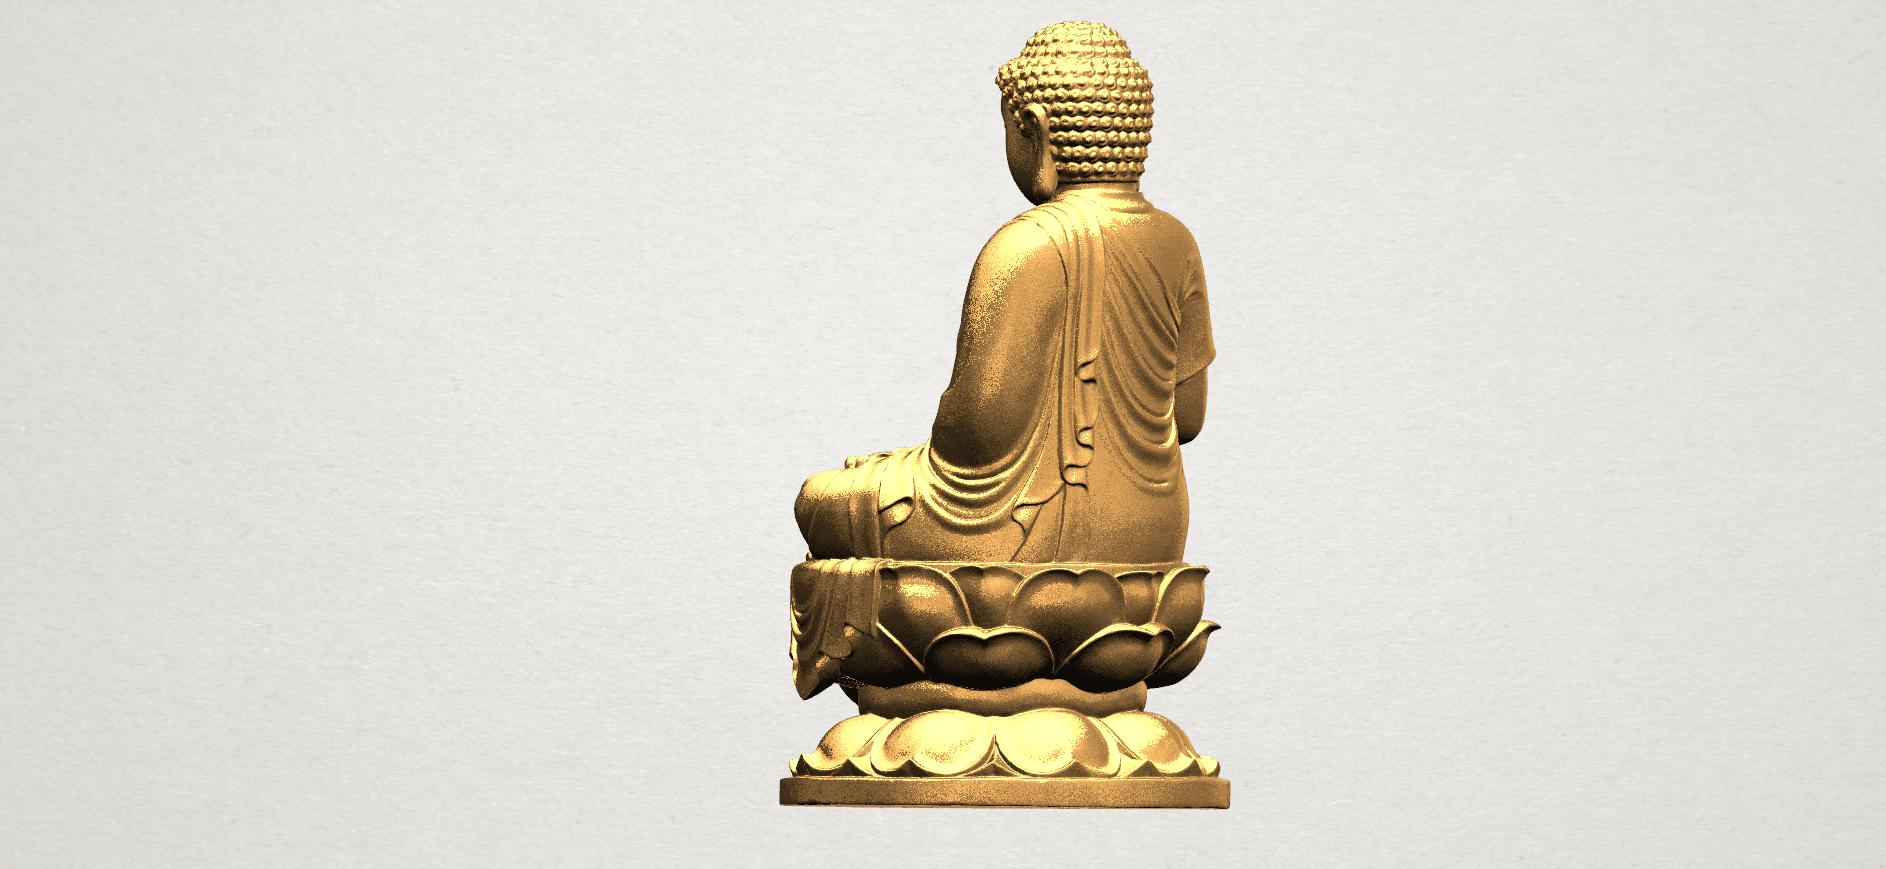 Gautama Buddha (ii) A04.png Download free STL file Gautama Buddha 02 • 3D print template, GeorgesNikkei